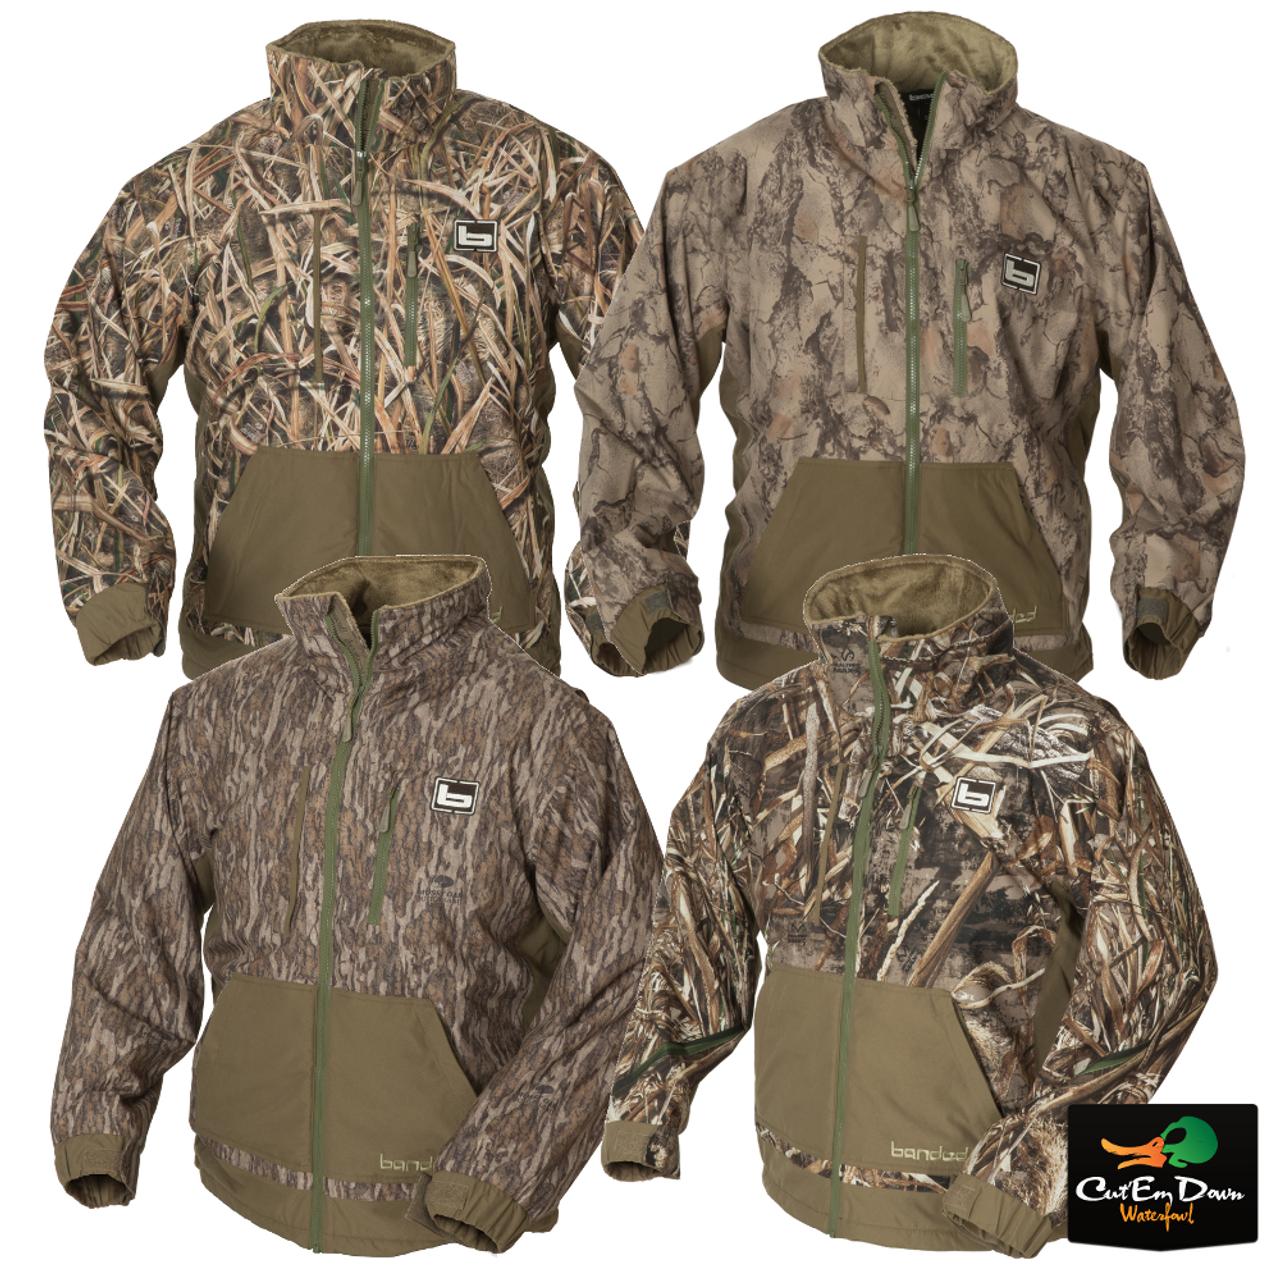 e1725213386f2 Banded Gear Chesapeake Full Zip Jacket